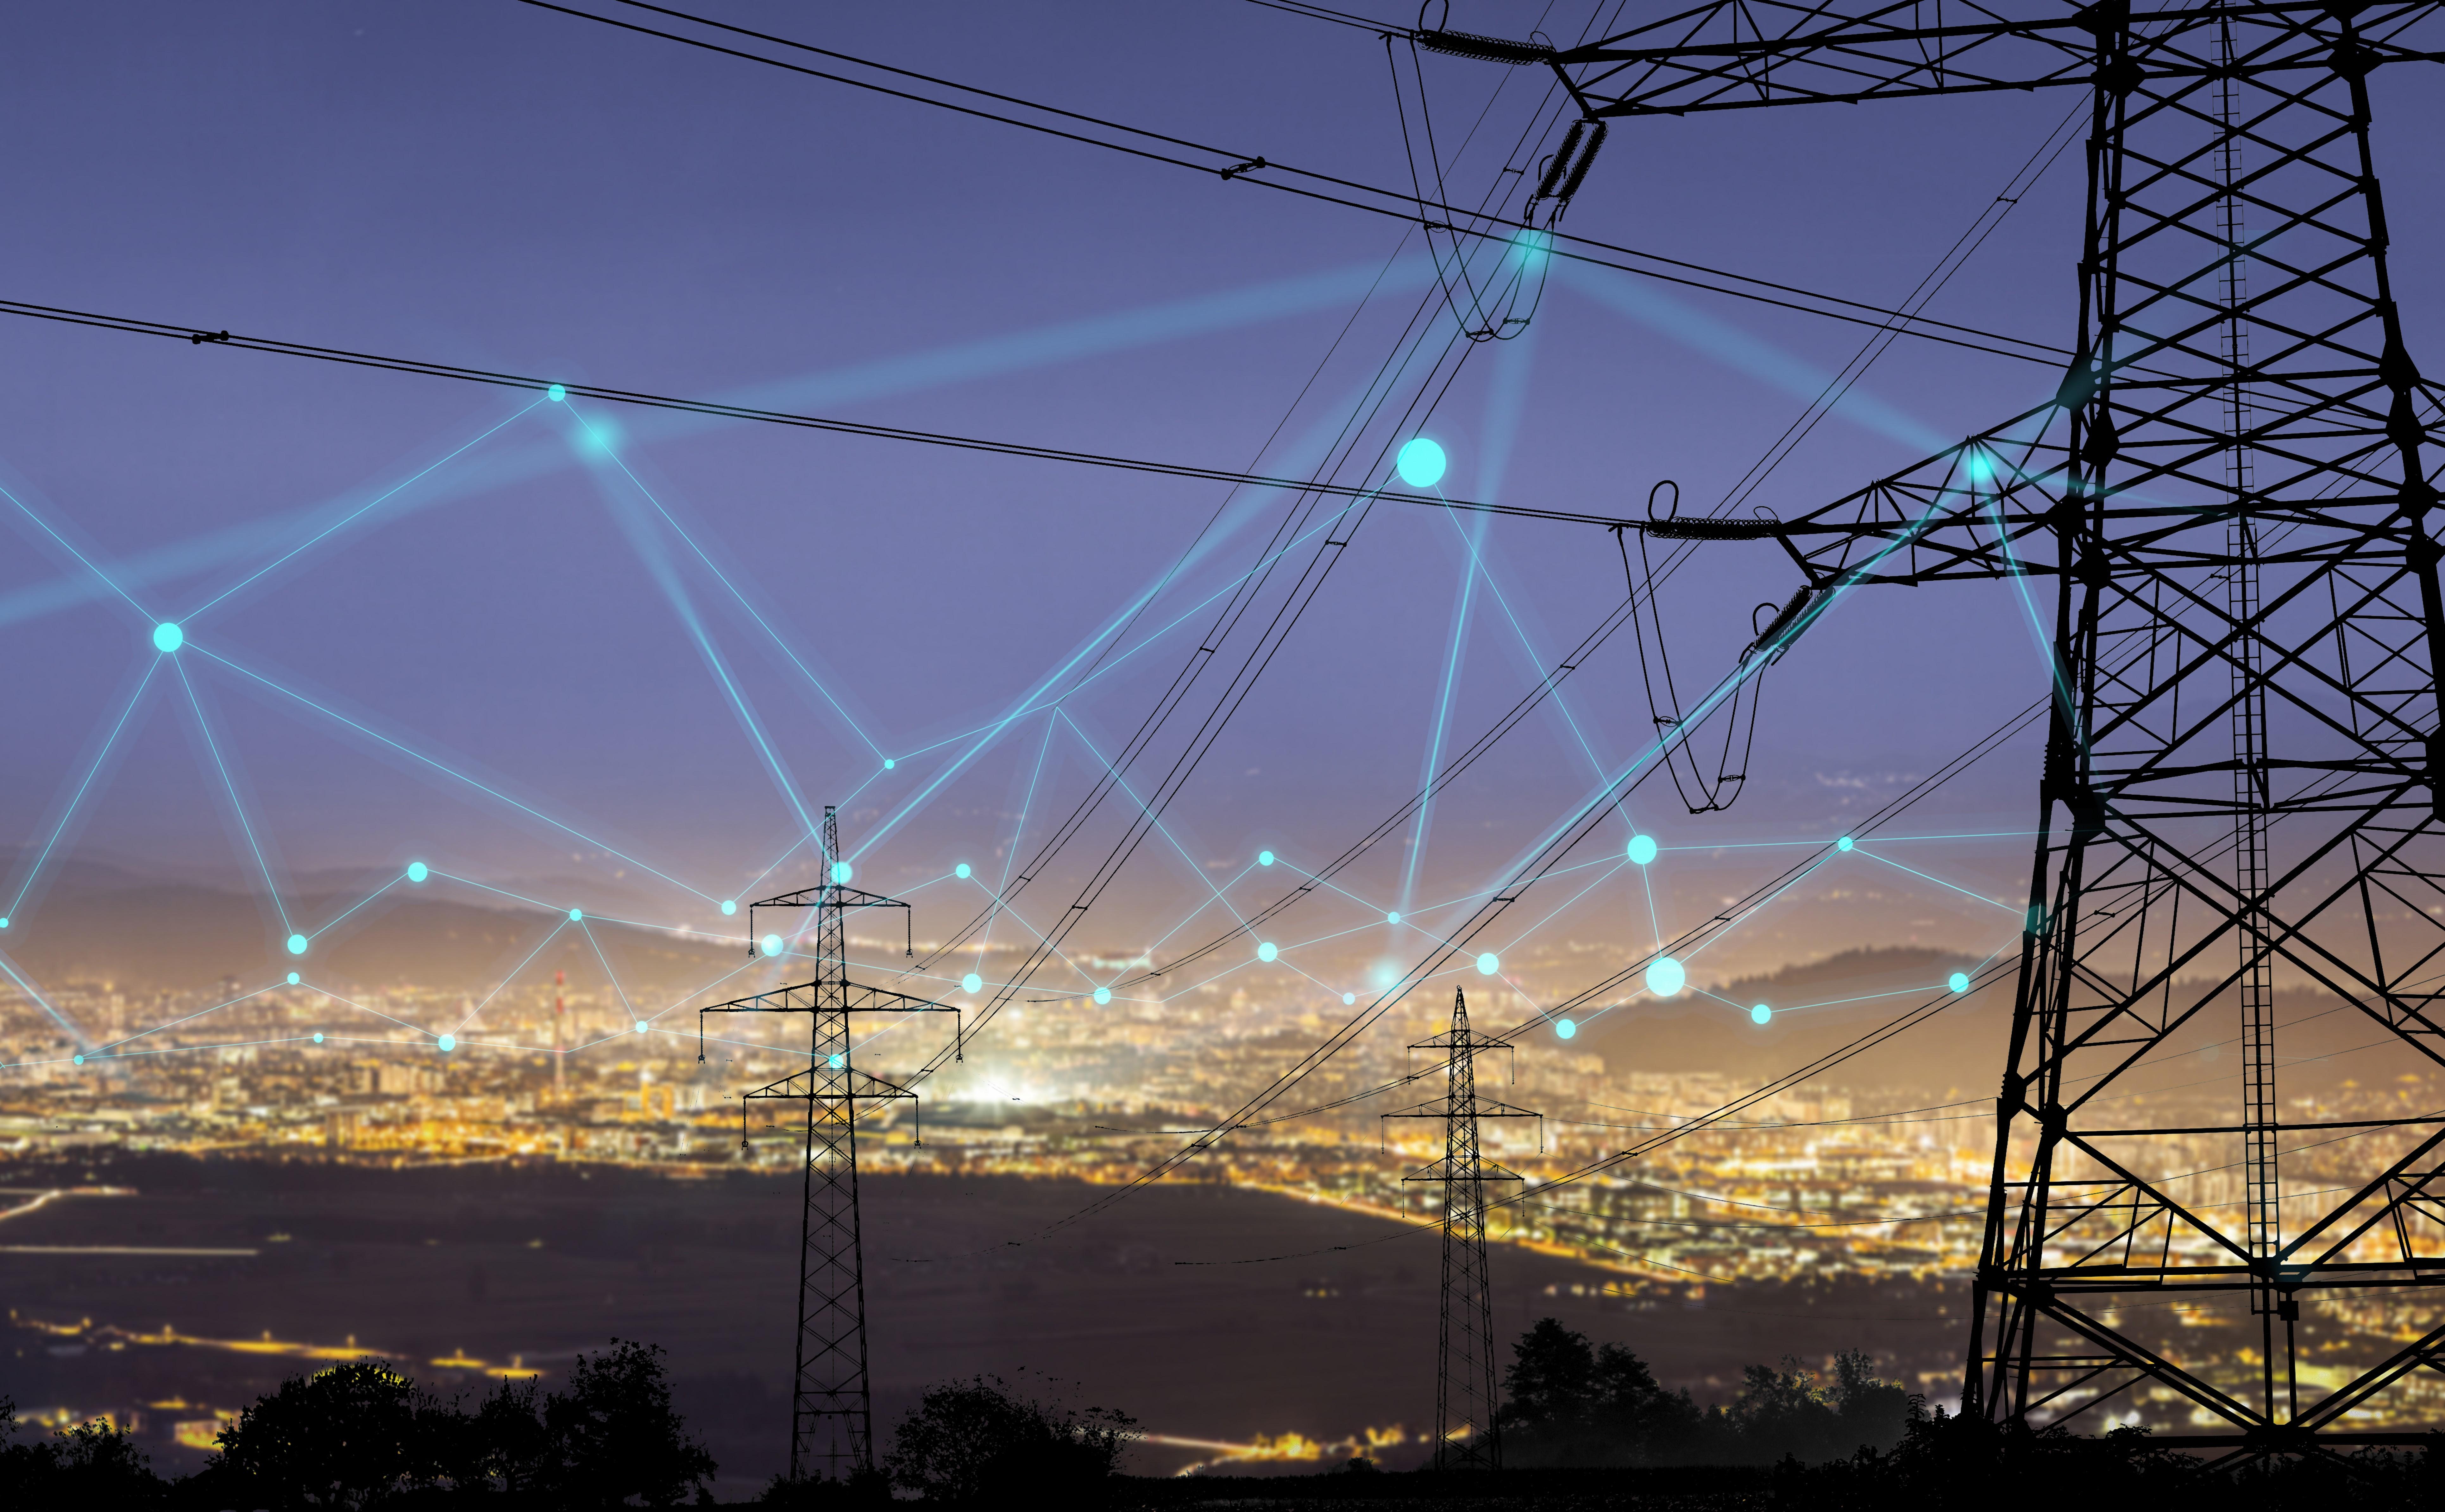 Photo of energy pylons